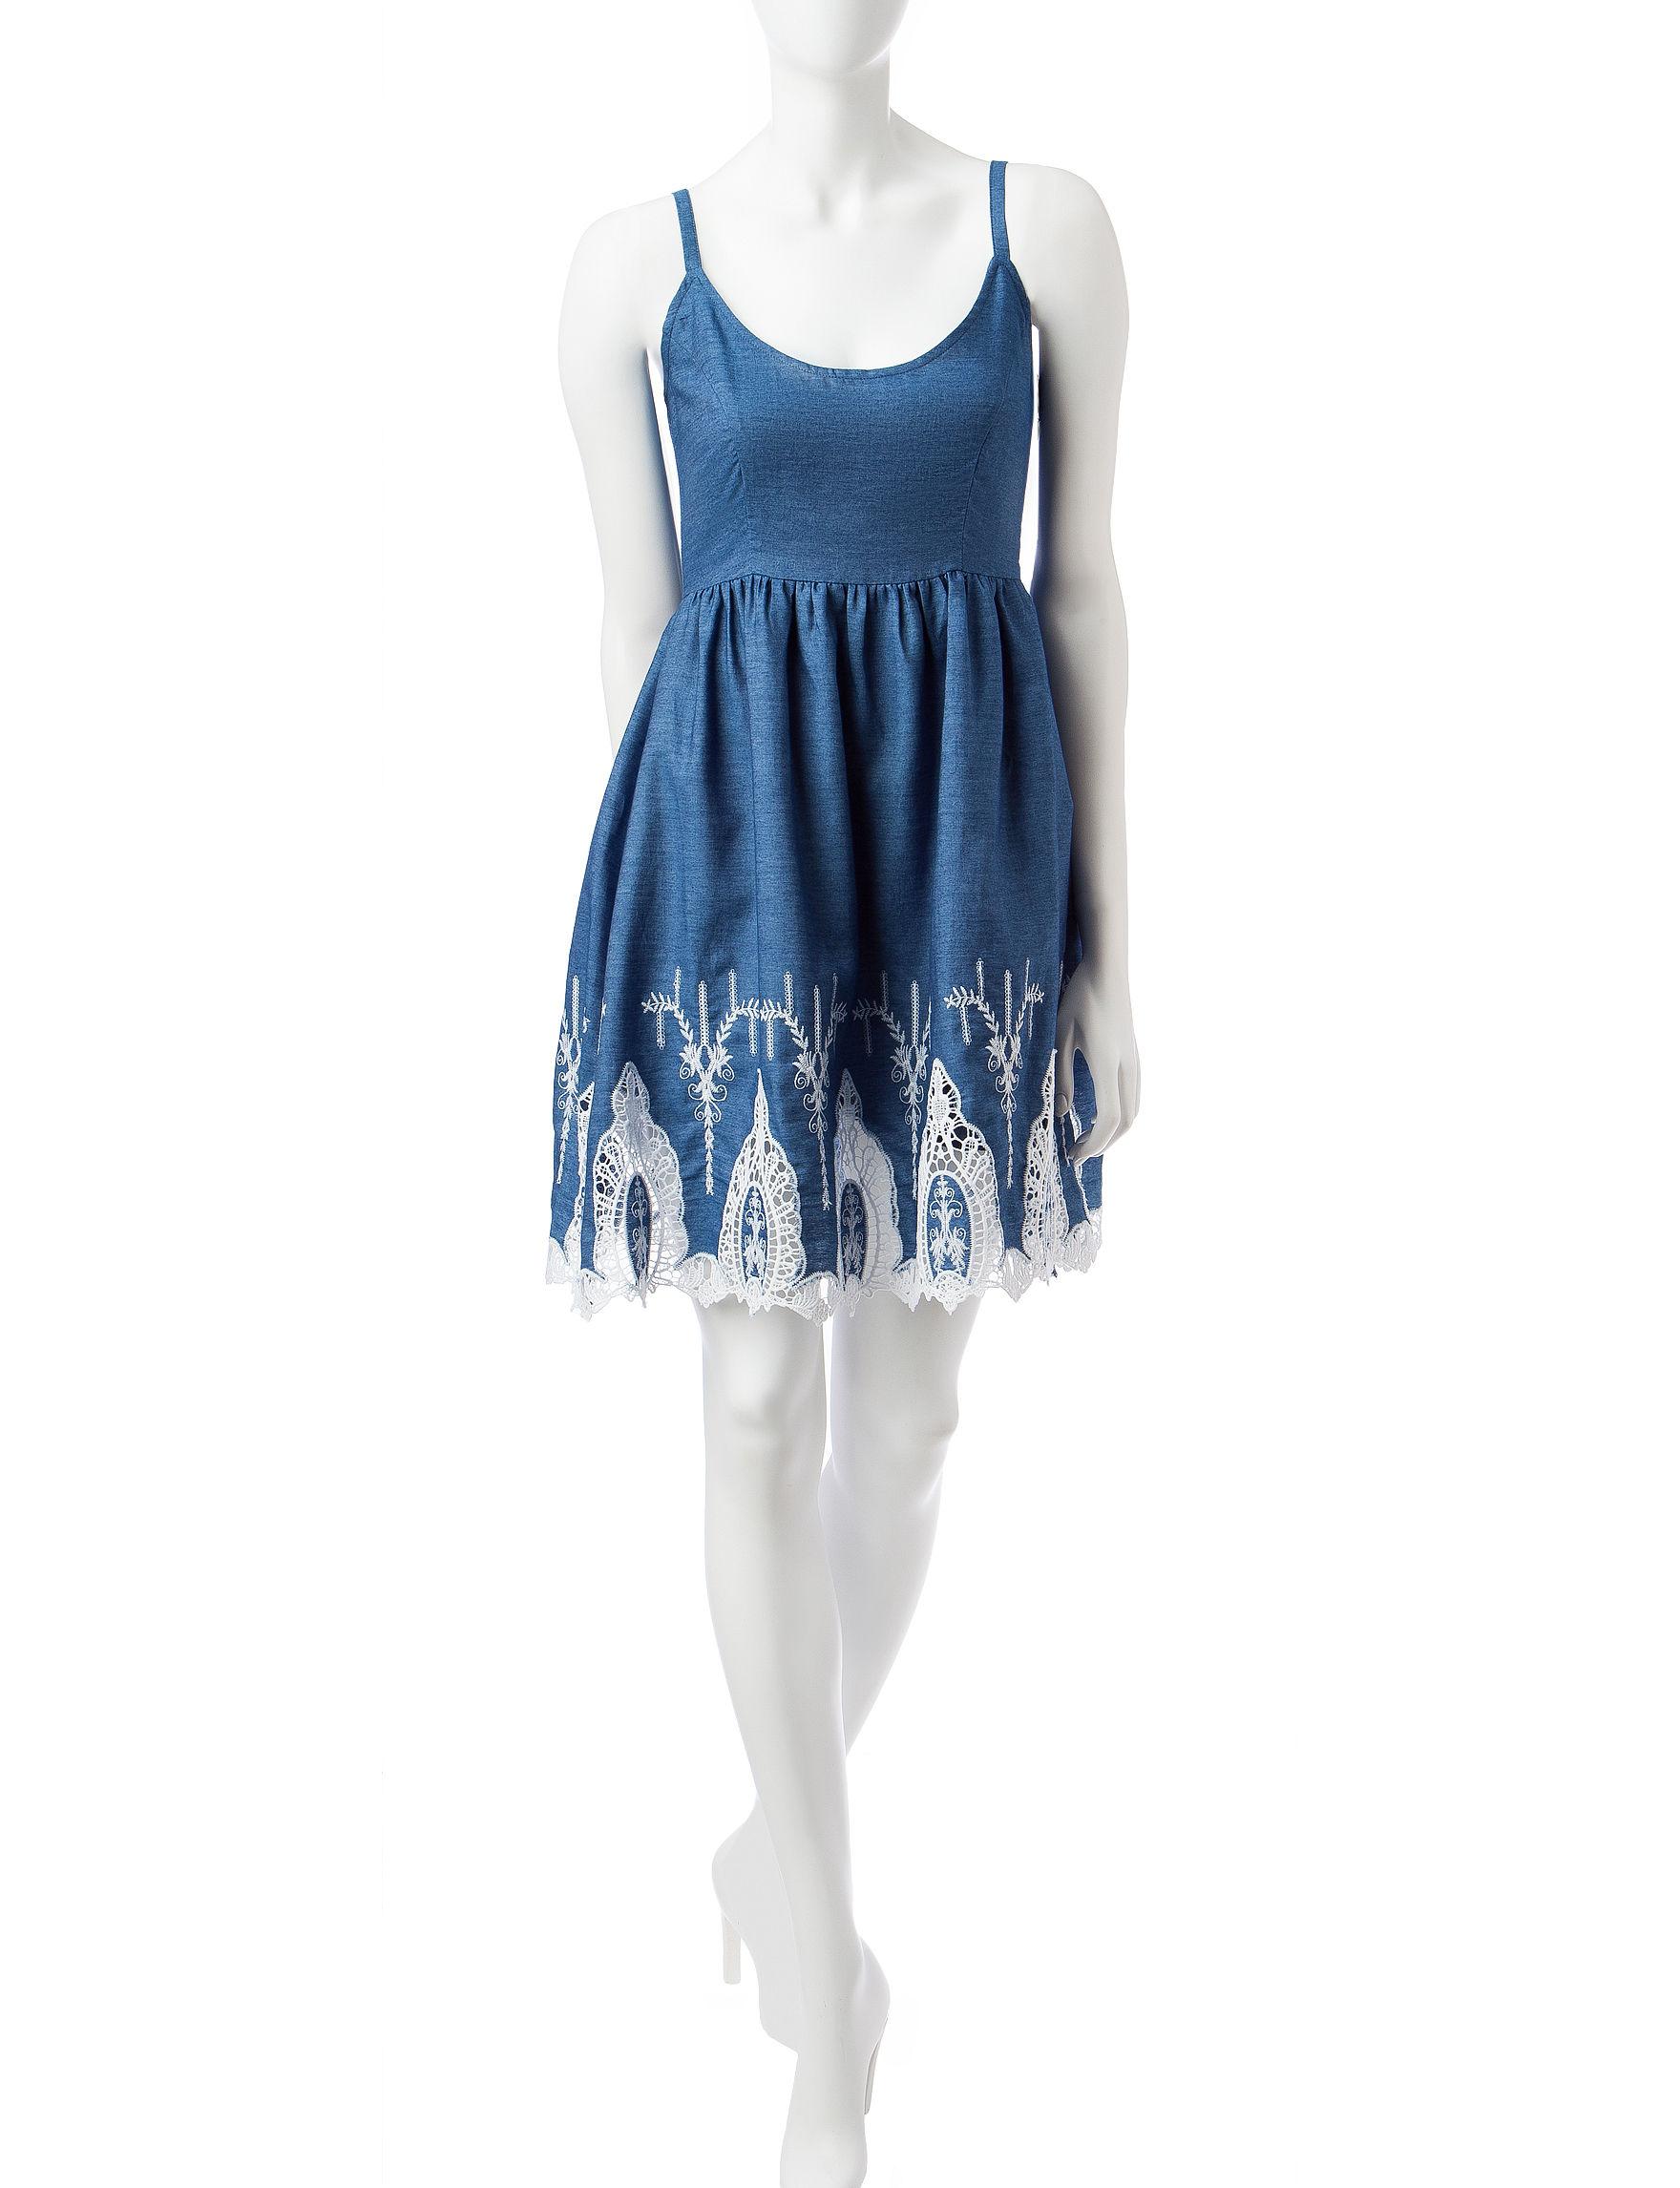 Signature Studio Blue / White Everyday & Casual Fit & Flare Dresses